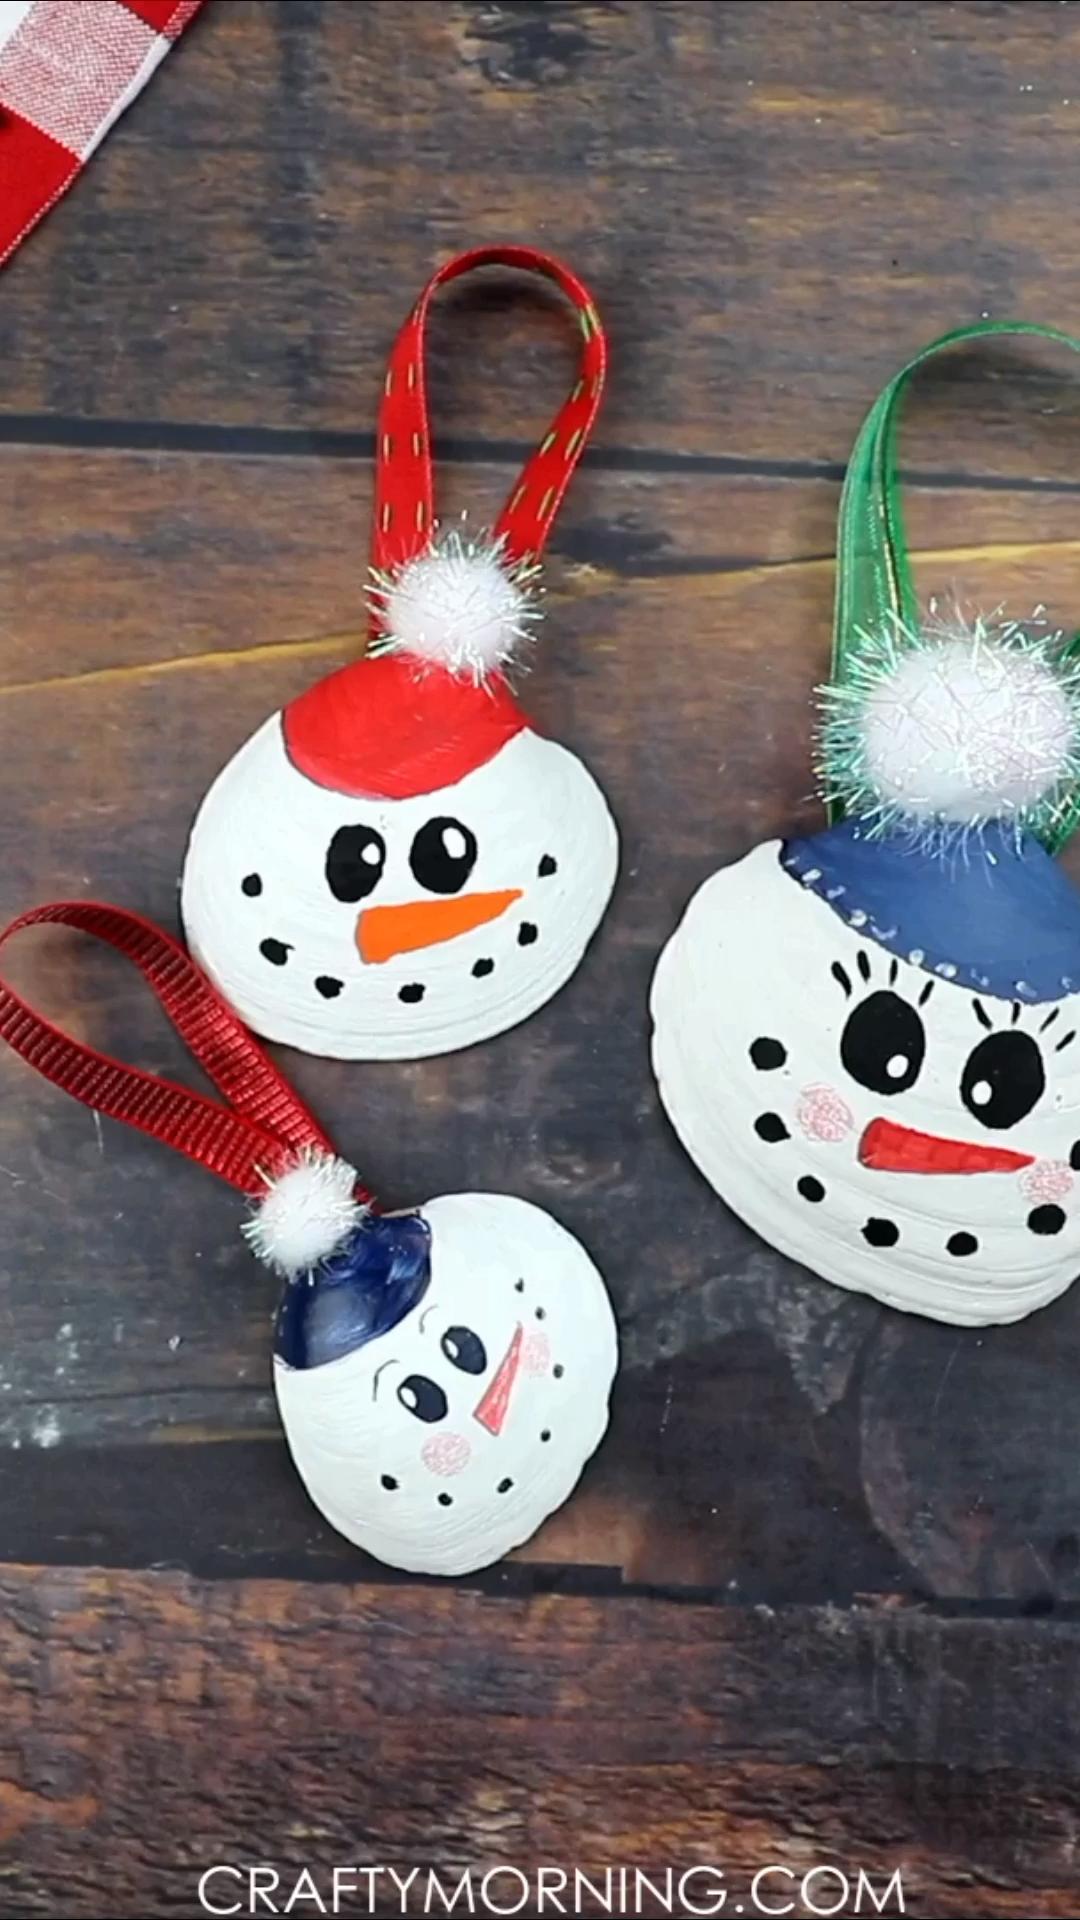 Snowman Seashell Ornaments Video Christmas Crafts Christmas Diy Christmas Ornament Crafts